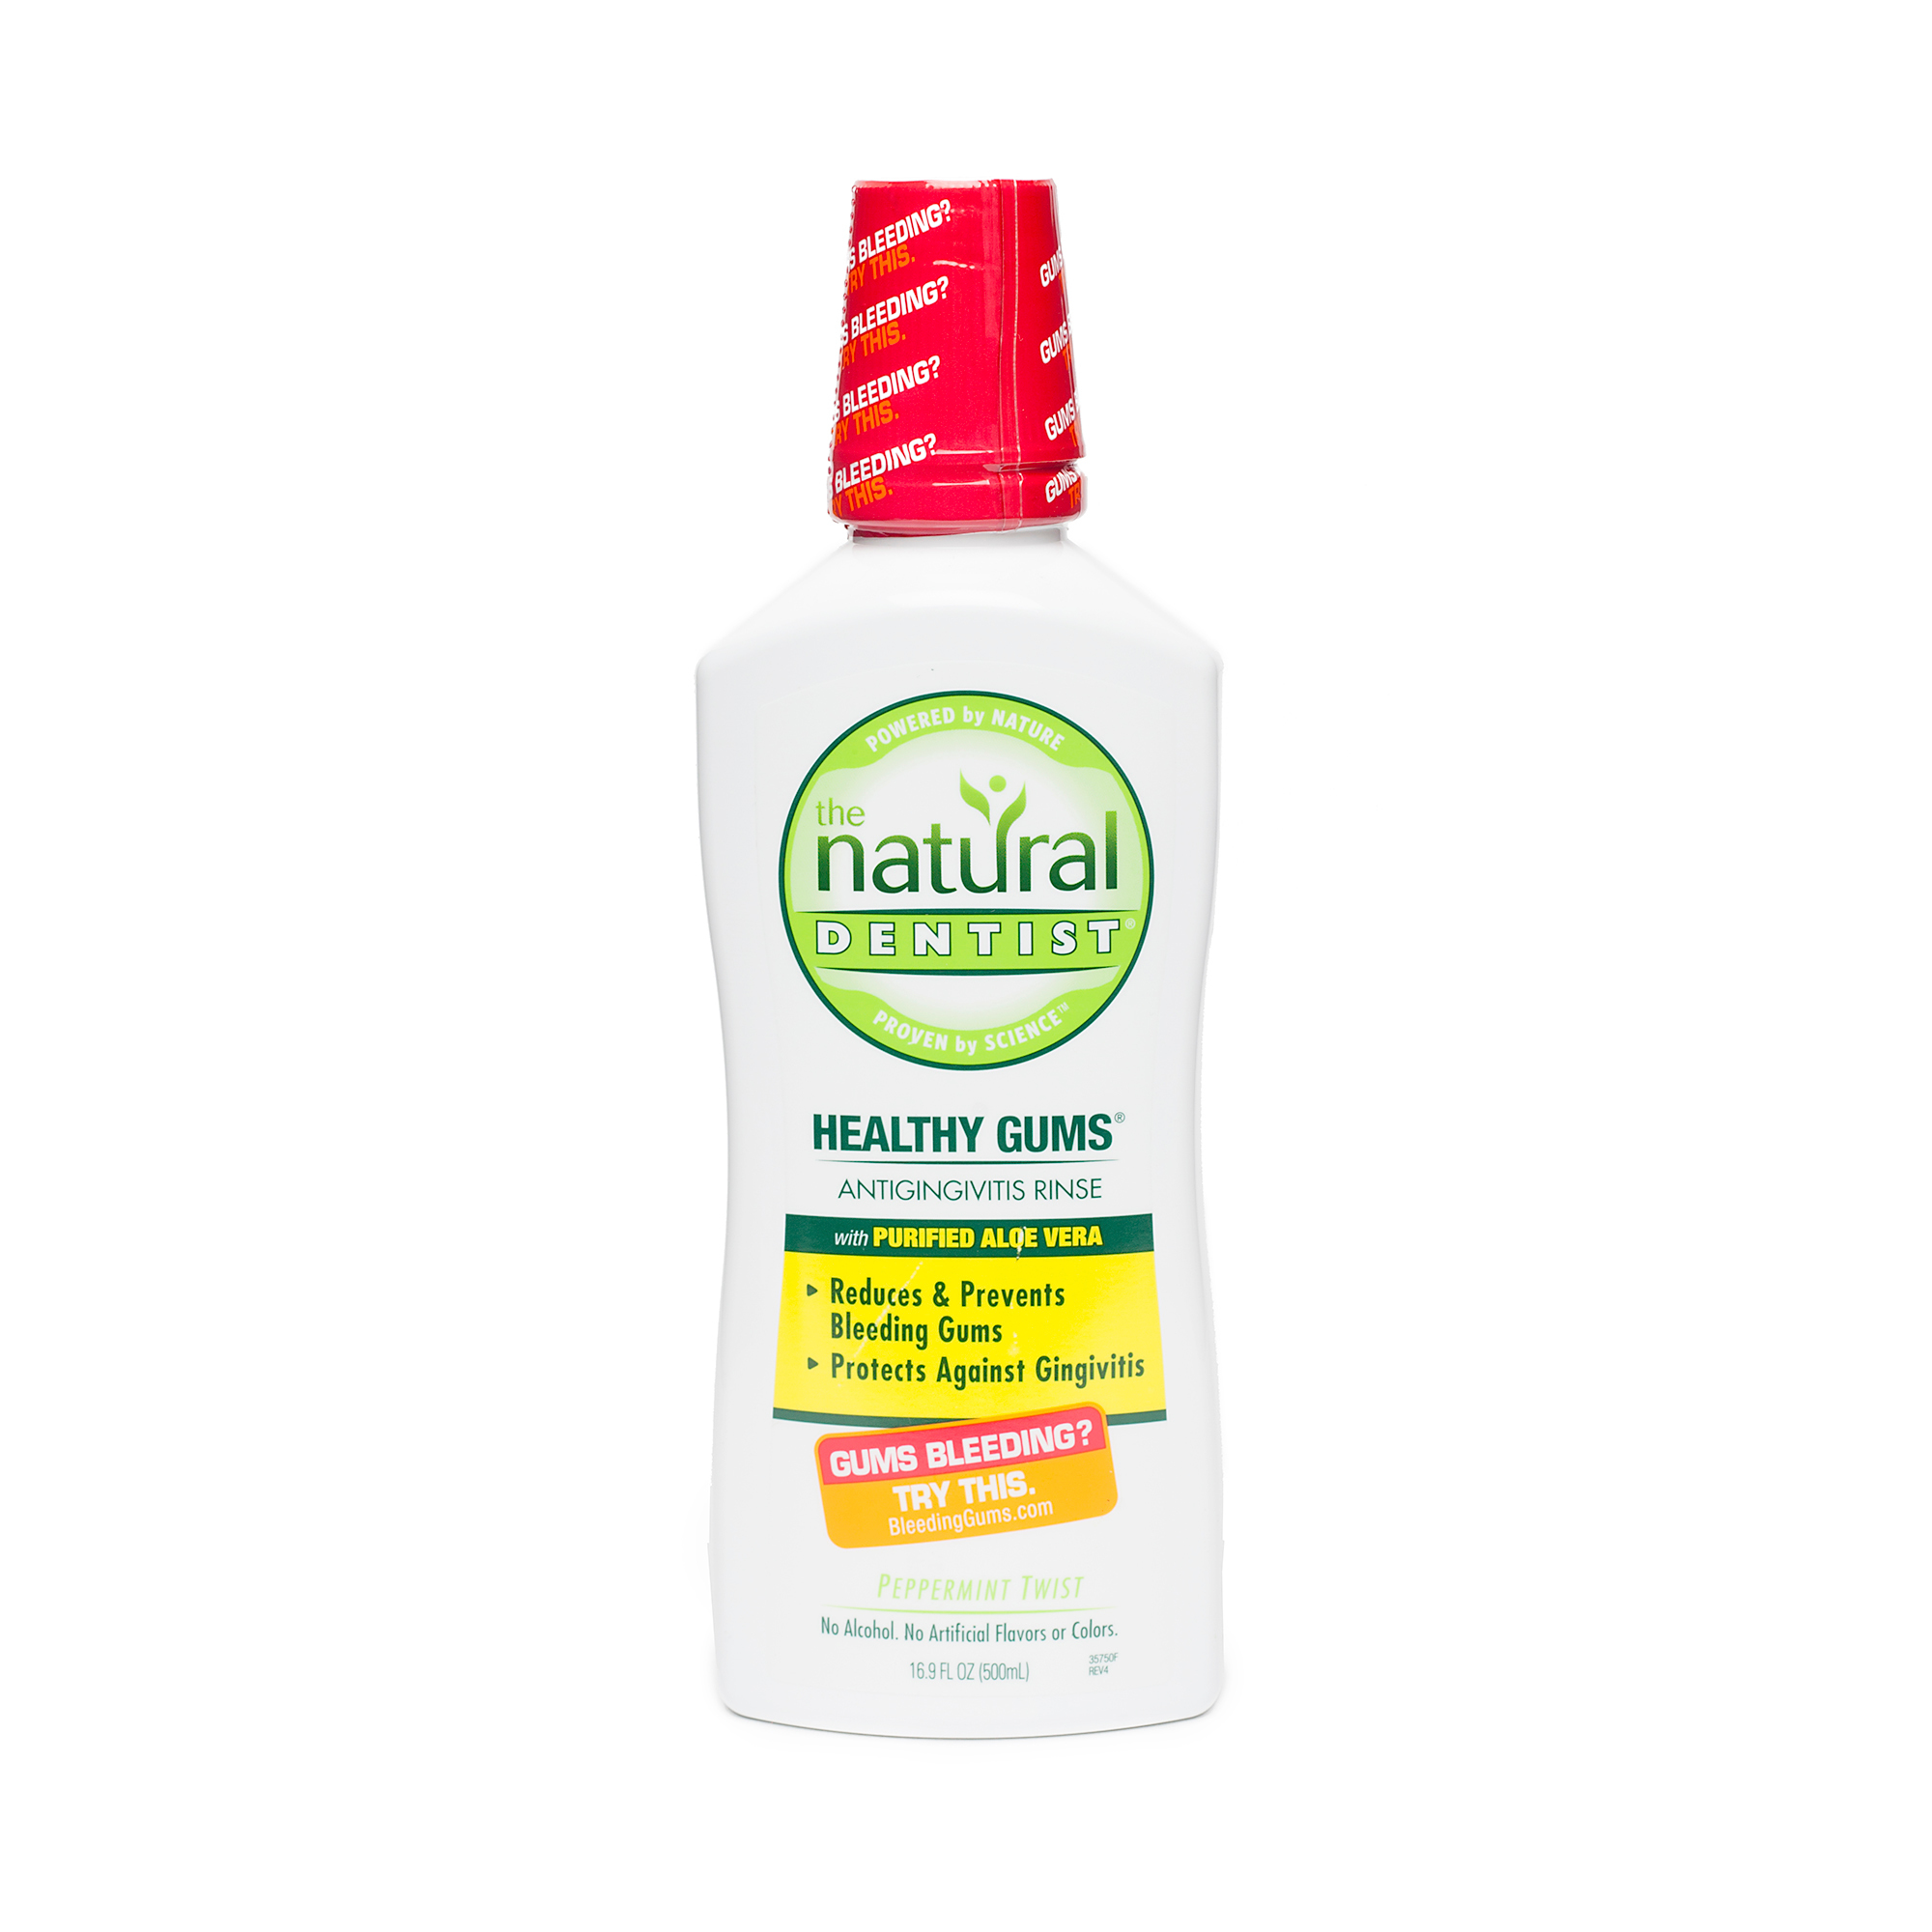 406642e0cd72 Healthy Gums Antigingivitis Rinse - Peppermint Twist